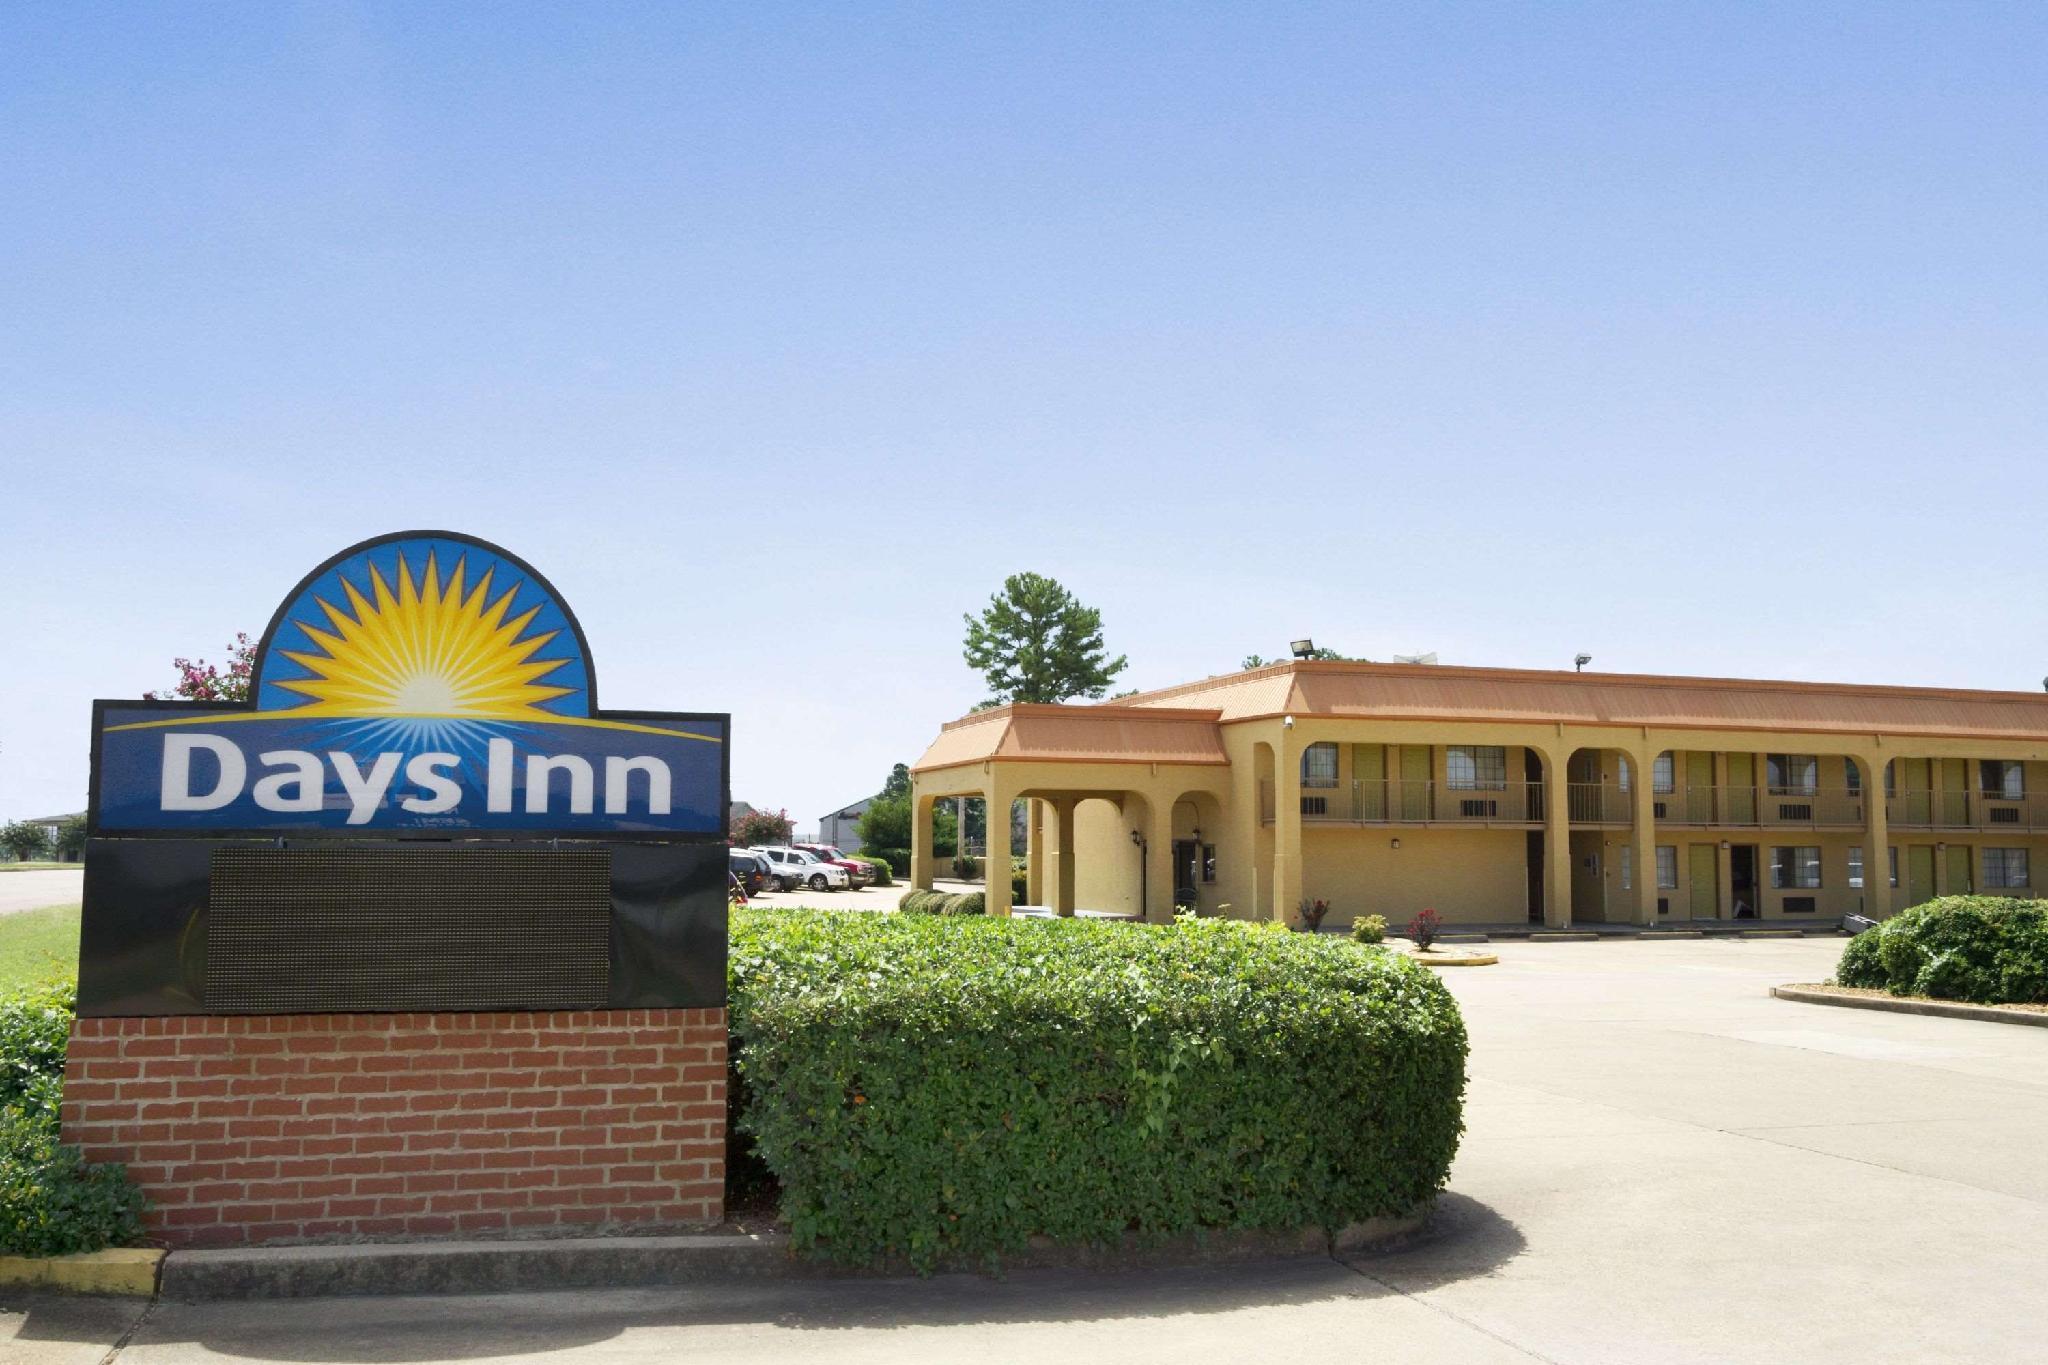 Days Inn By Wyndham Southaven MS